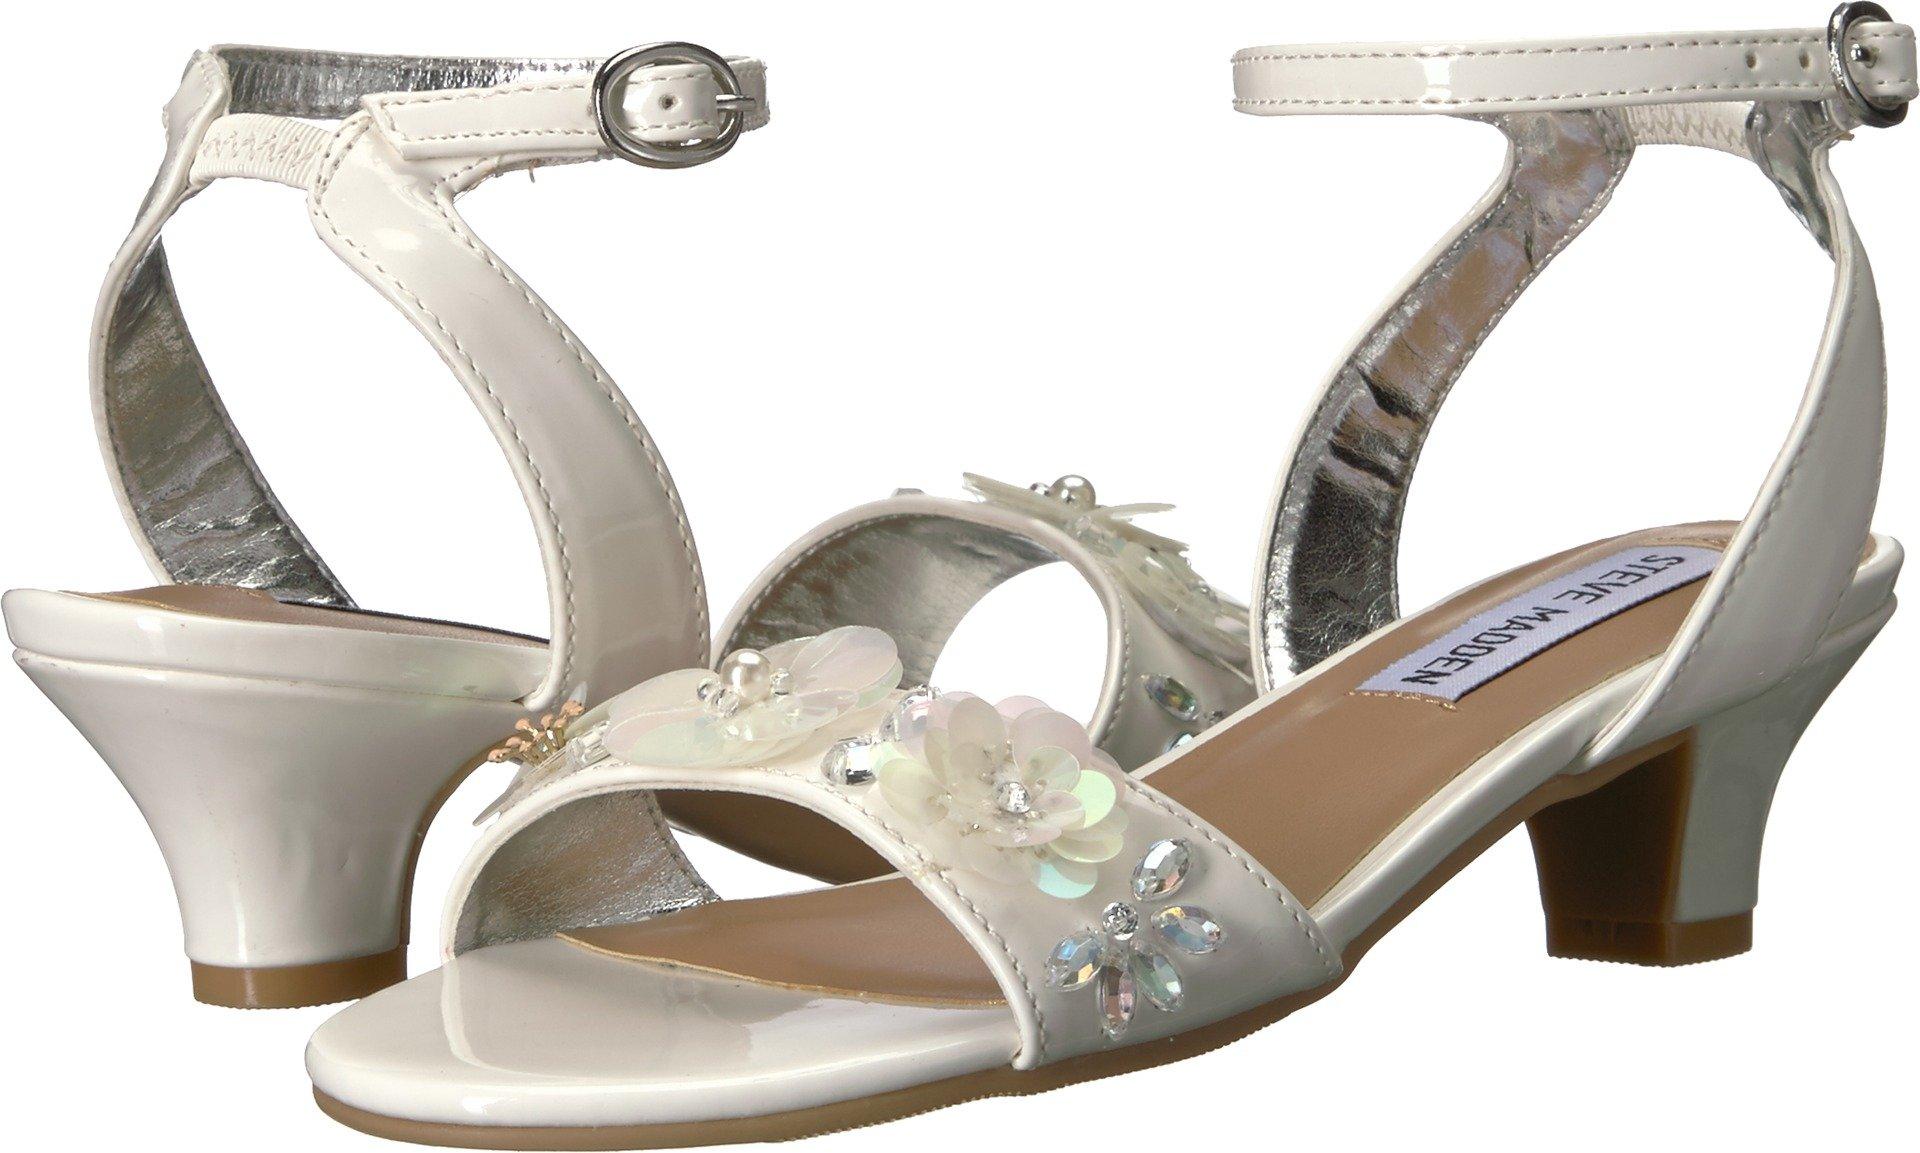 Steve Madden Girls' Jcorsage Heeled Sandal, White, 5 M US Big Kid